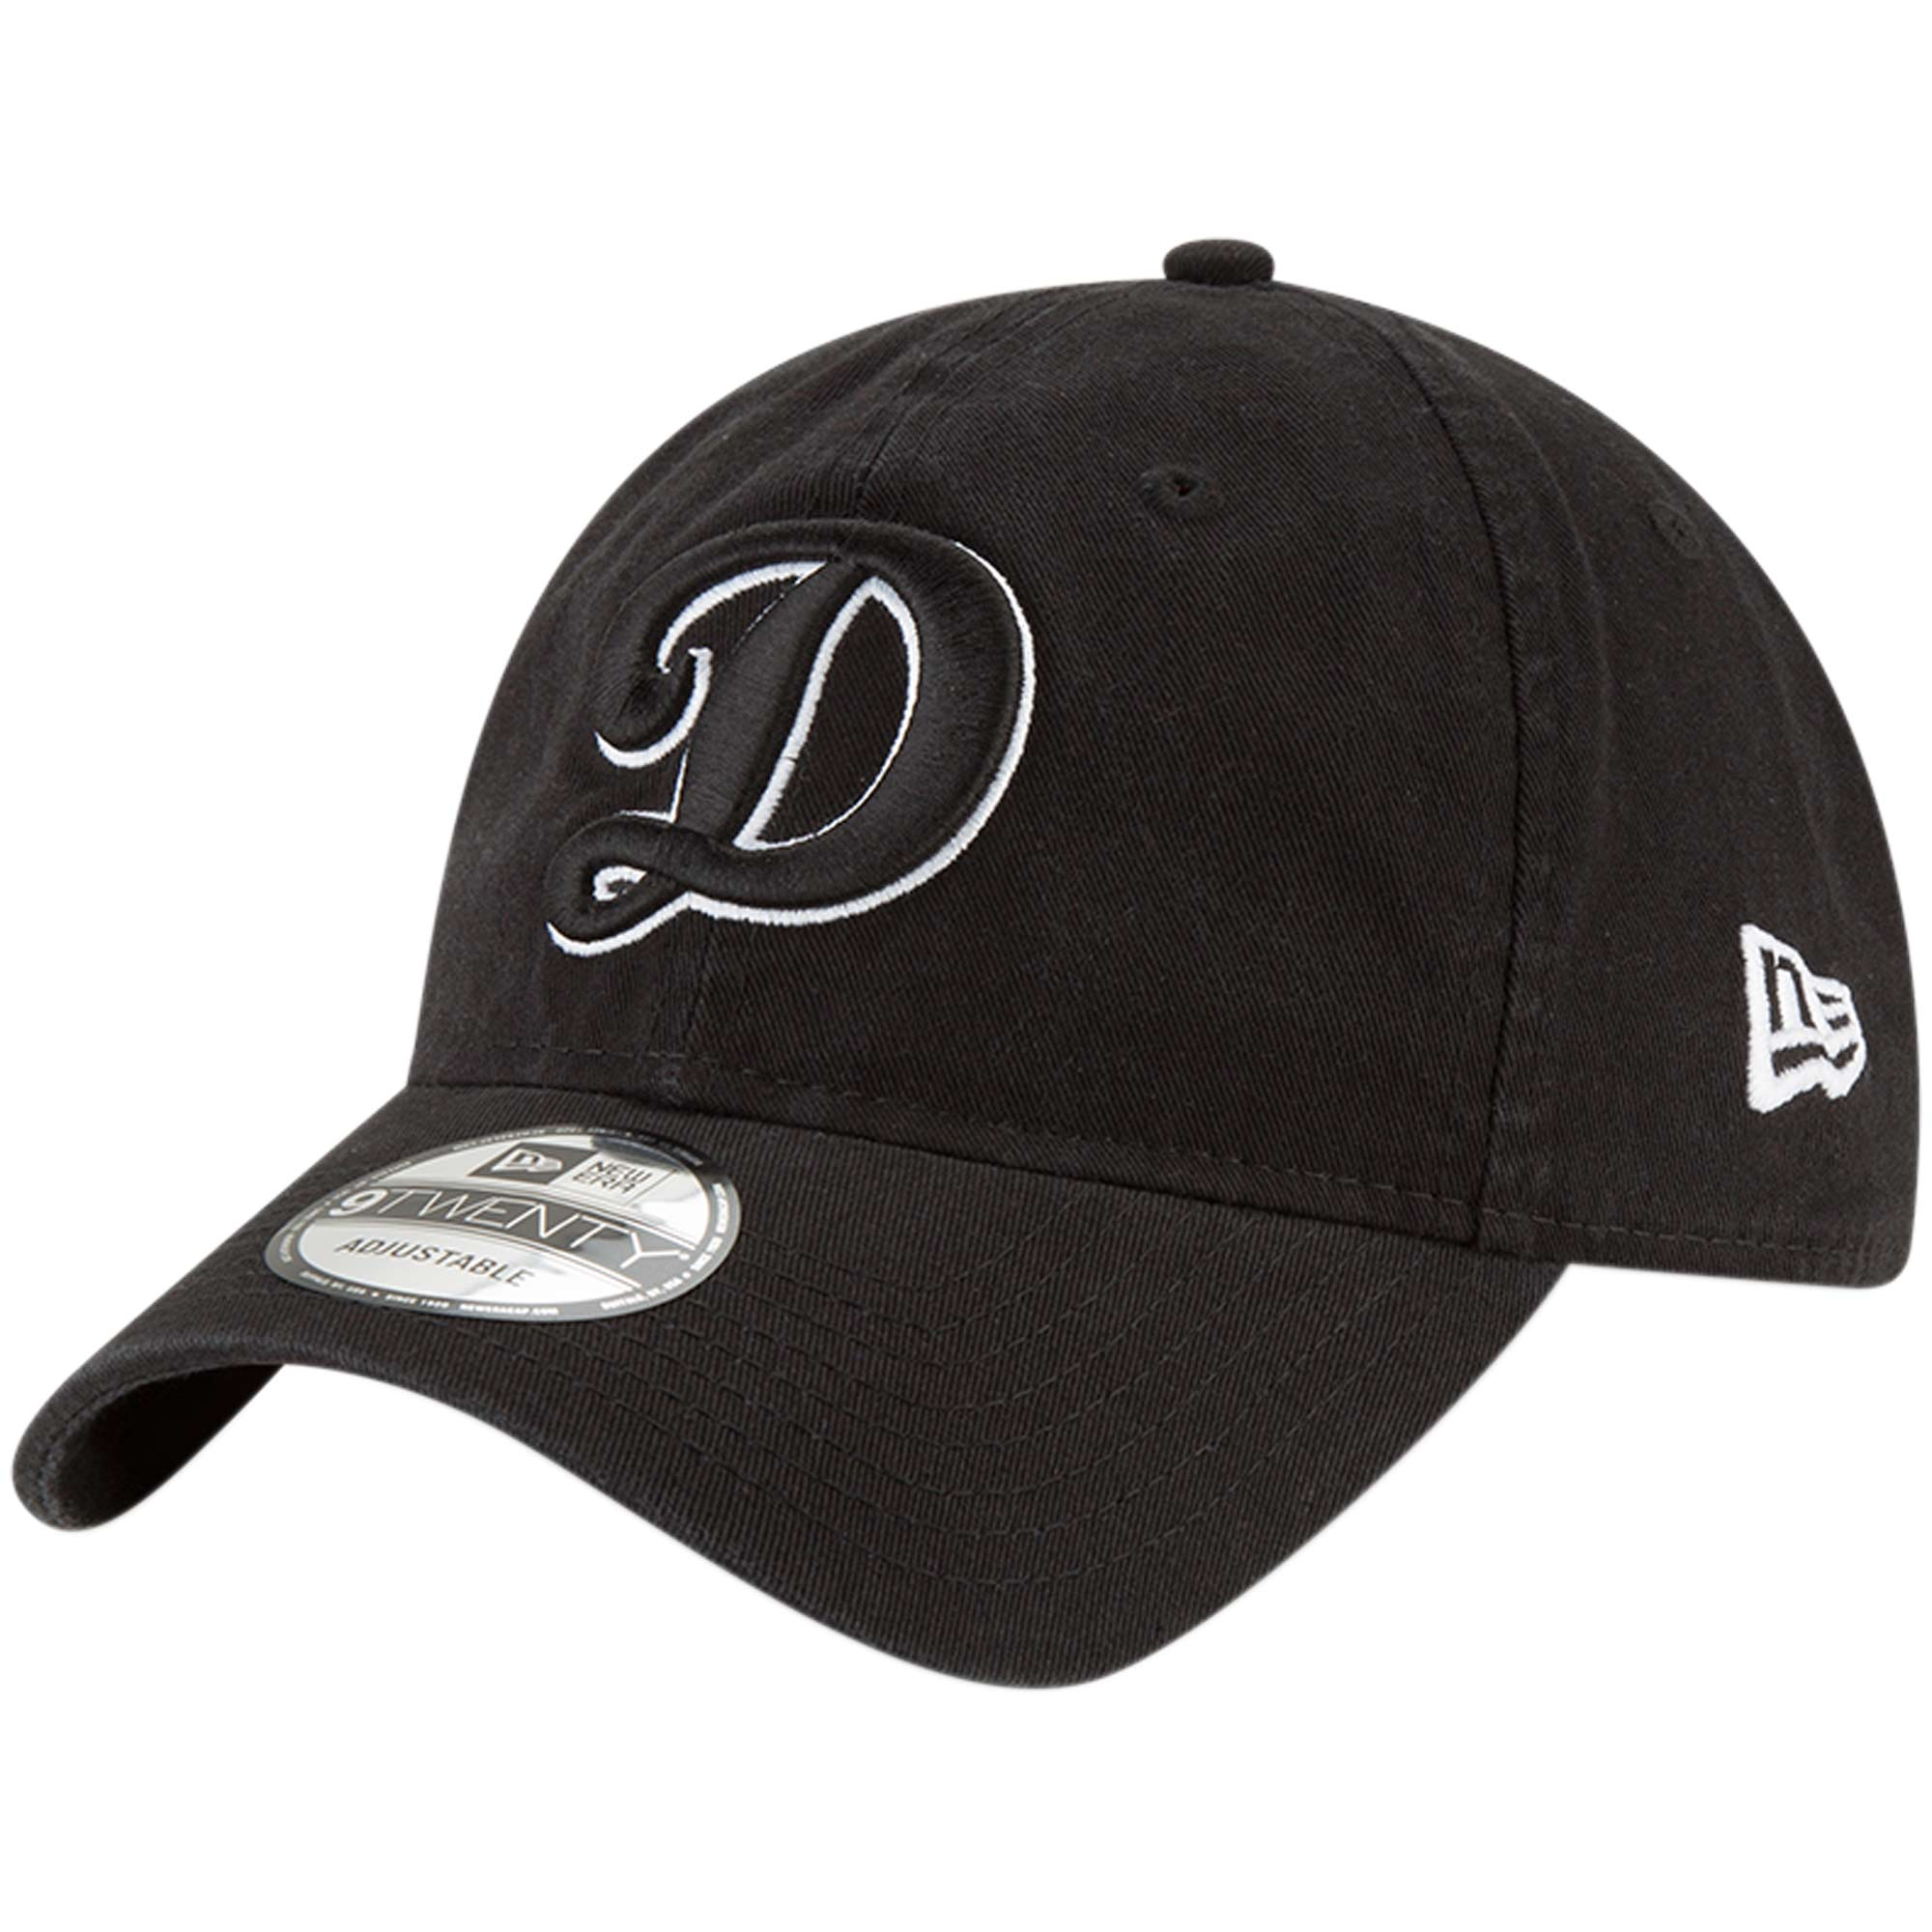 Los Angeles Dodgers New Era Core Classic Twill 9TWENTY Adjustable Hat - Black